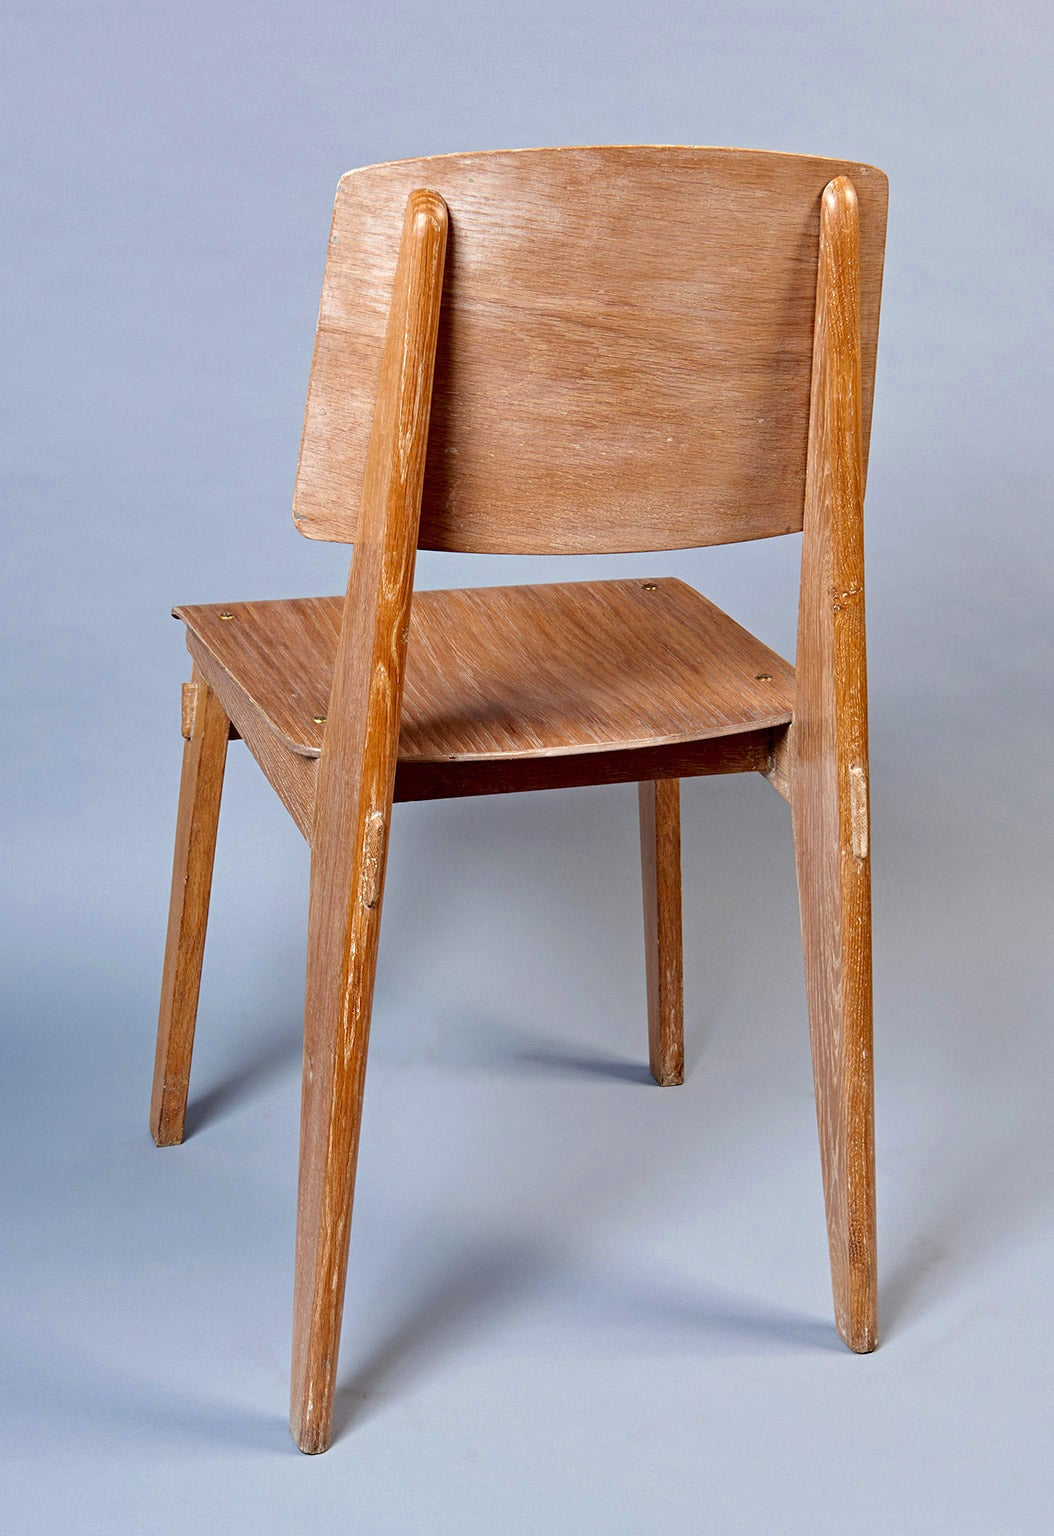 Chaise jean prouve prix 28 images chaise en bois by for Chaise dentaire prix